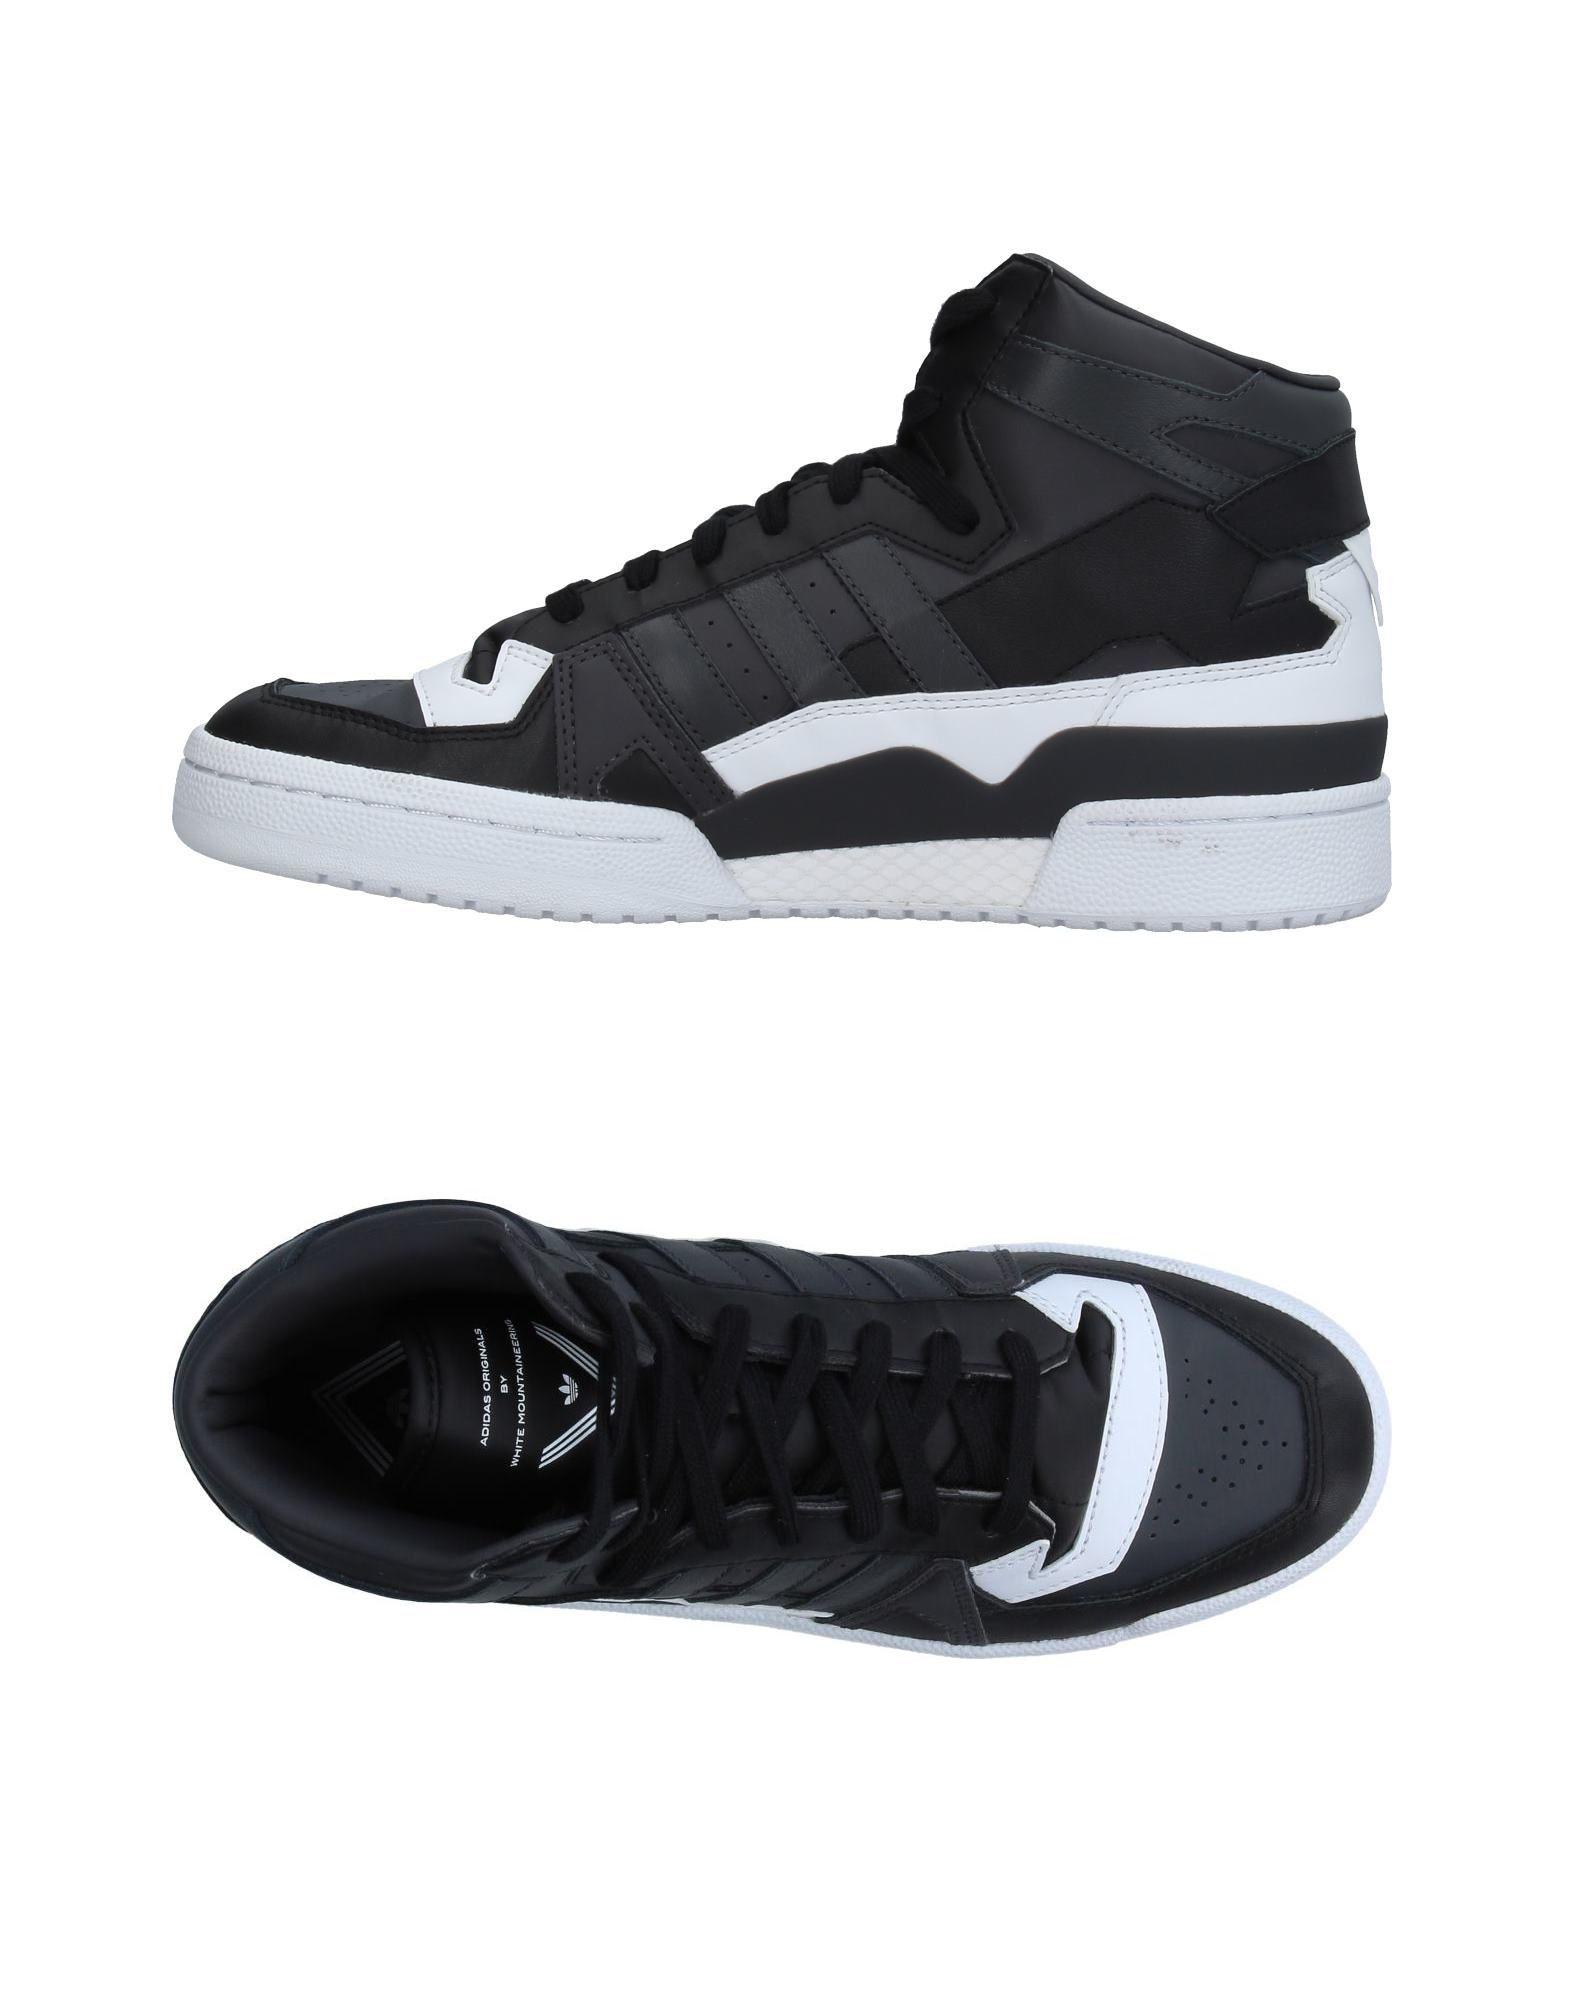 Adidas Originals By White Mountaineering Sneakers Herren  11263861BQ